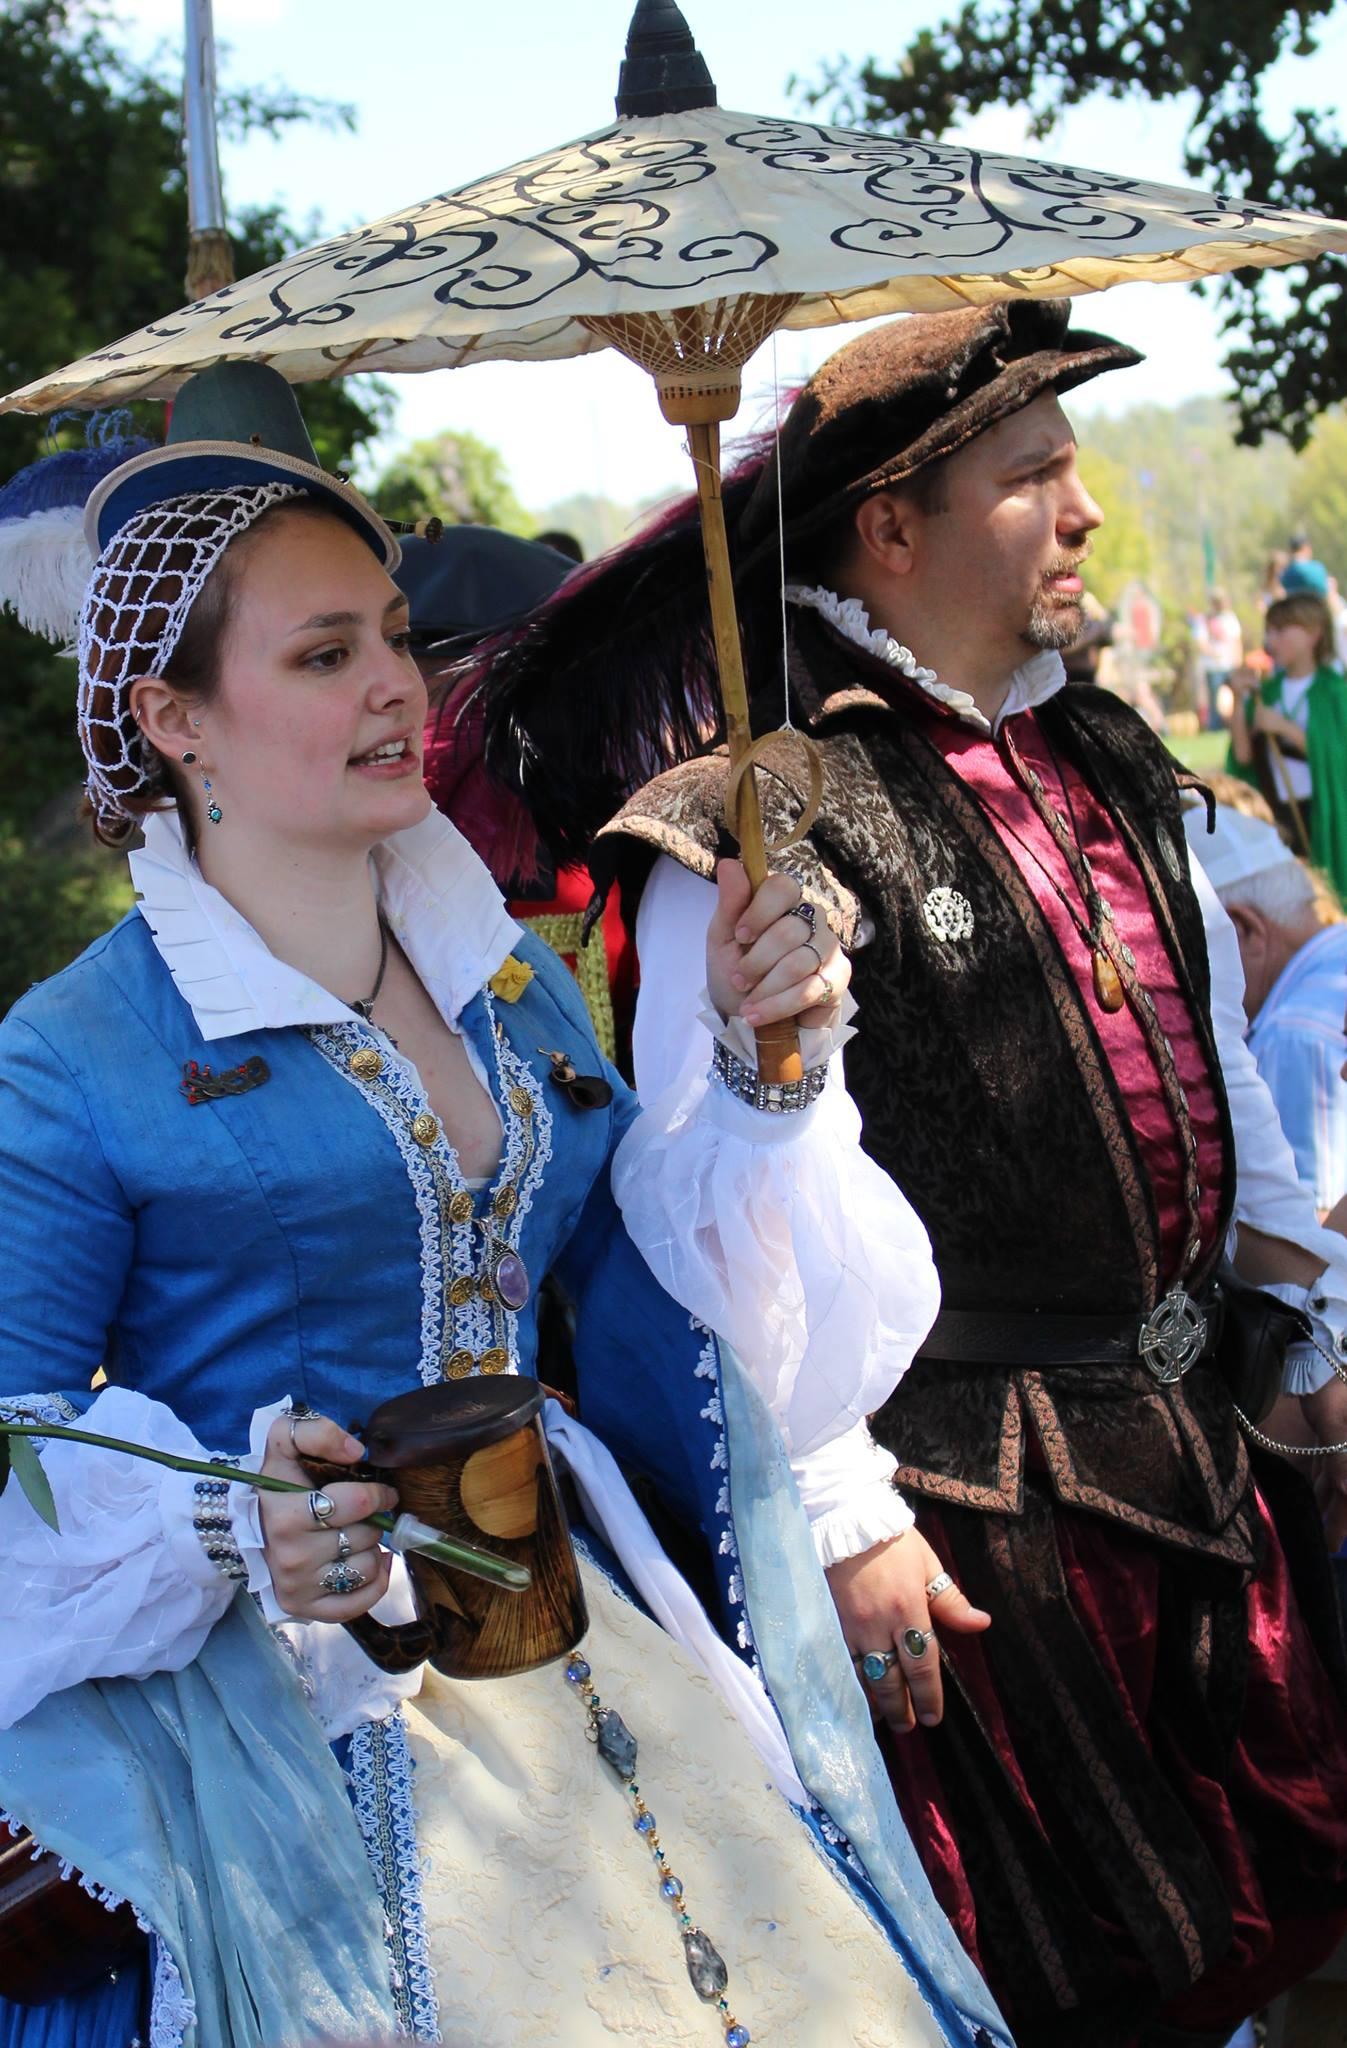 Themed Weddings Renaissance Civil War The Wizard Of Oz Oh My